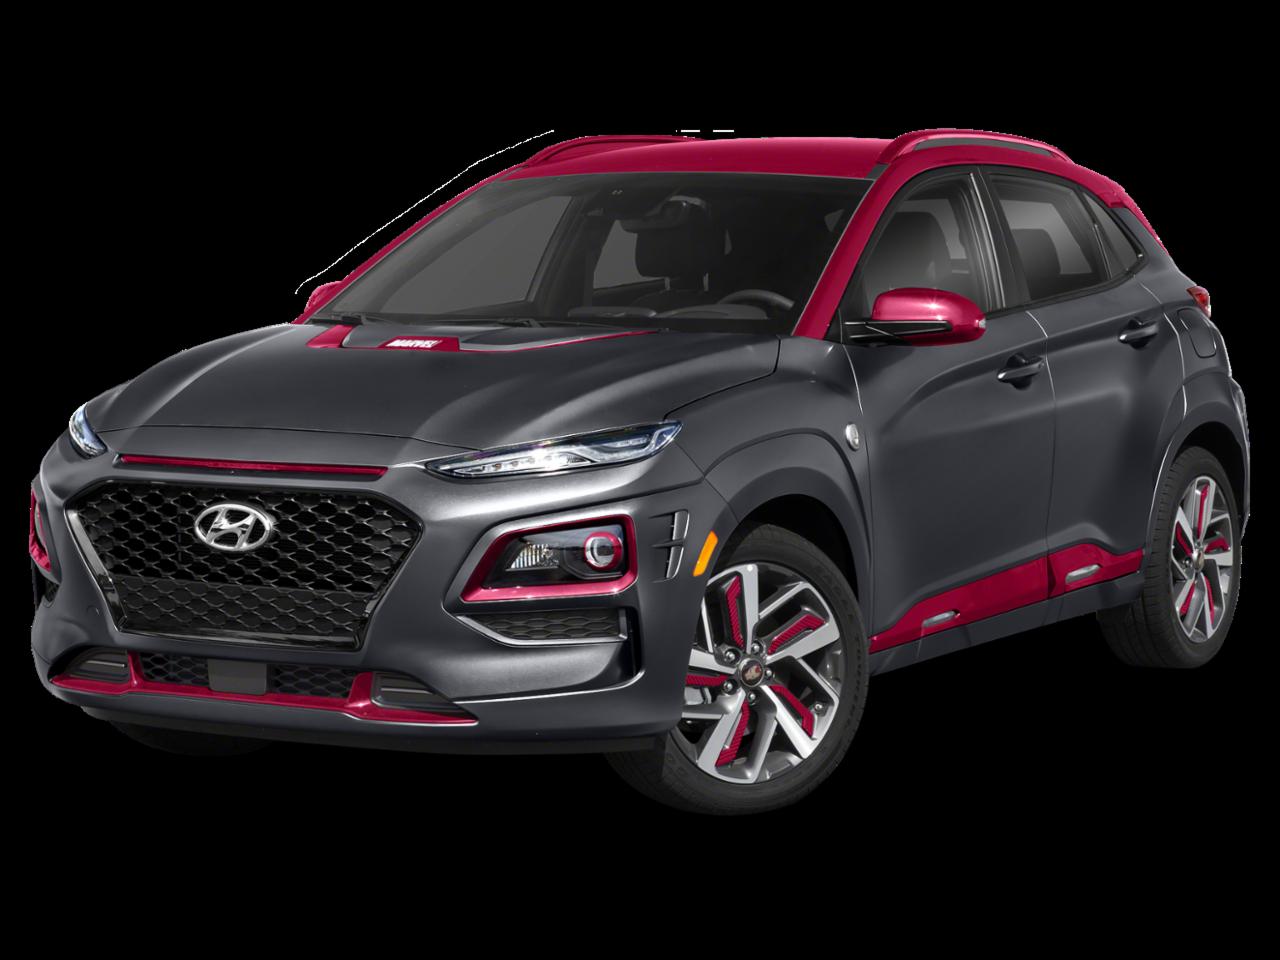 Hyundai 2019 Kona Iron Man